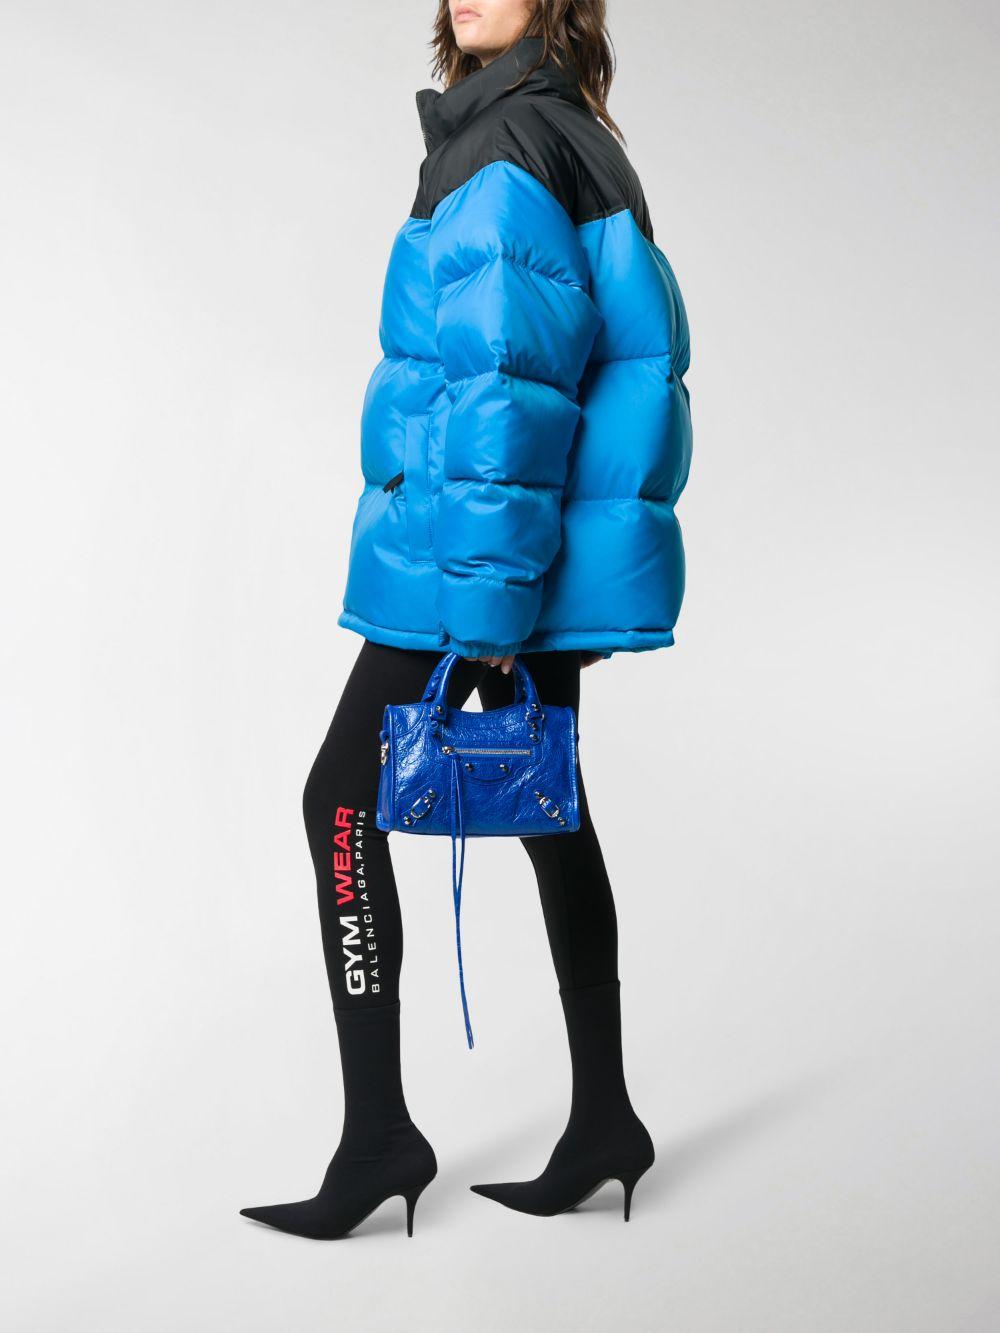 Black stretch cotton jersey Gym Wear foot leggings  BALENCIAGA |  | 629233-TIVD61000